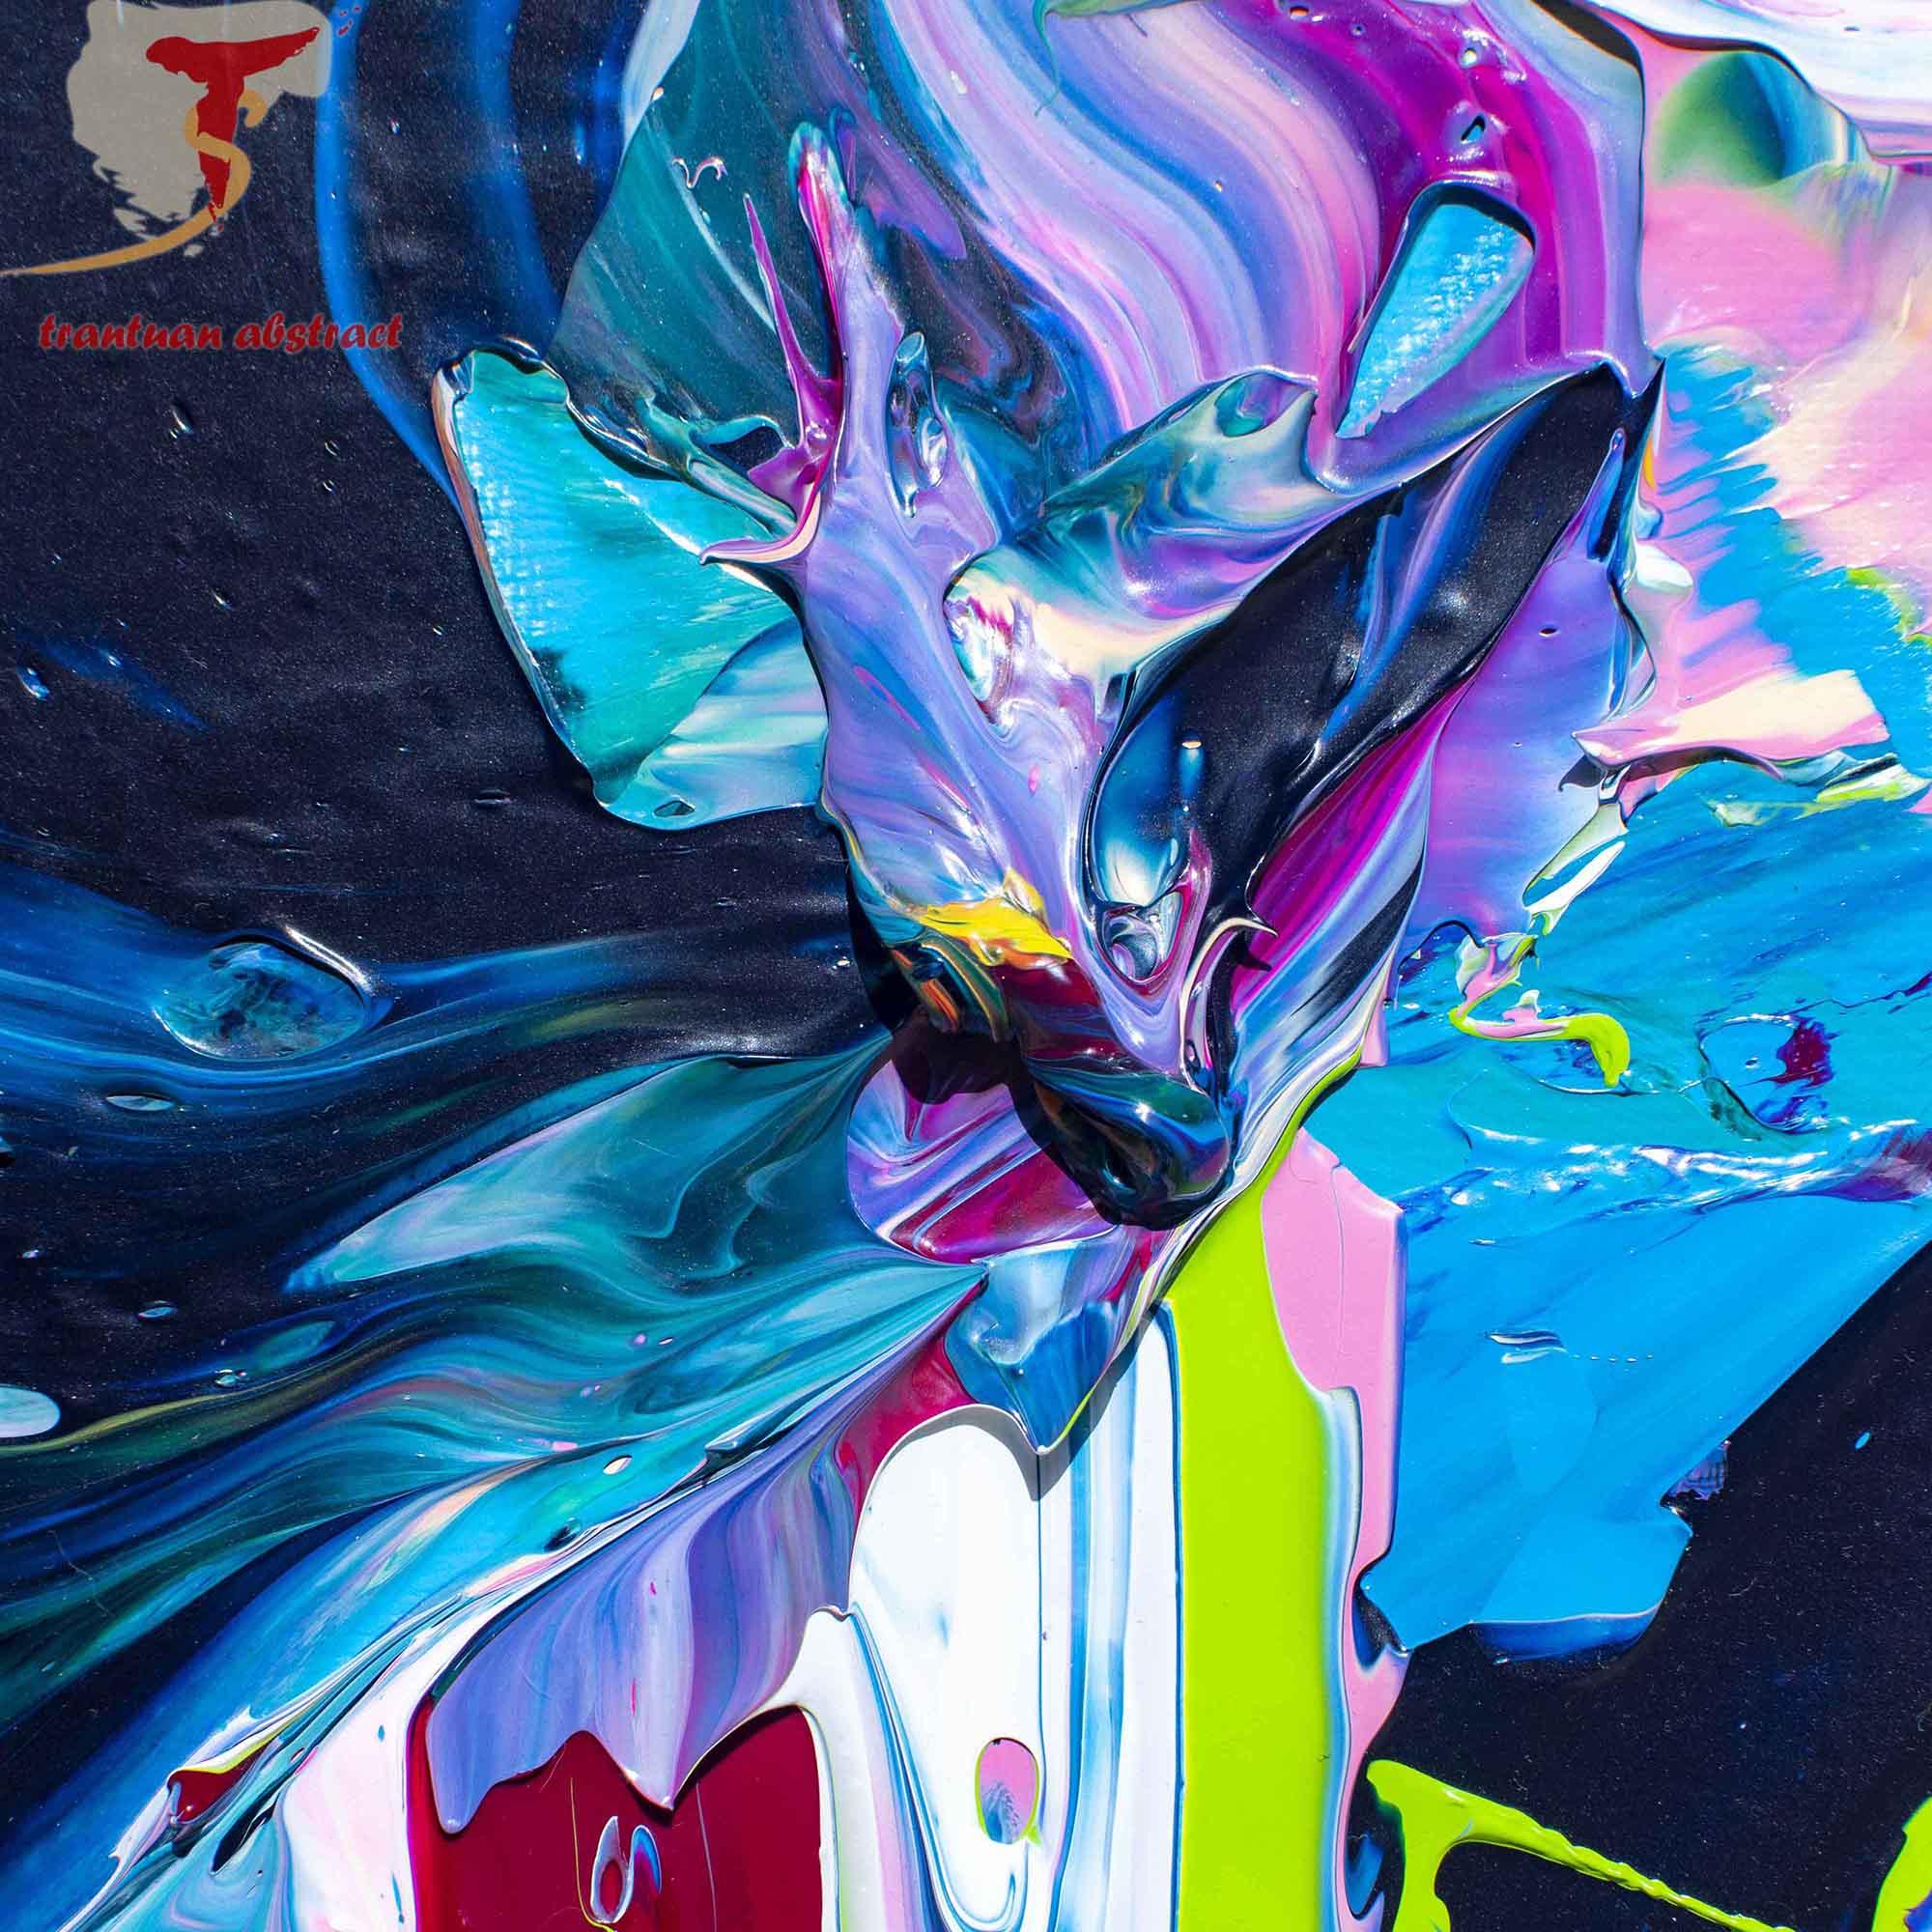 Tran Tuan Artist Agleam Florescence 120 x 100 x 5 cm Acrylic on Canvas Painting Detail s (5)